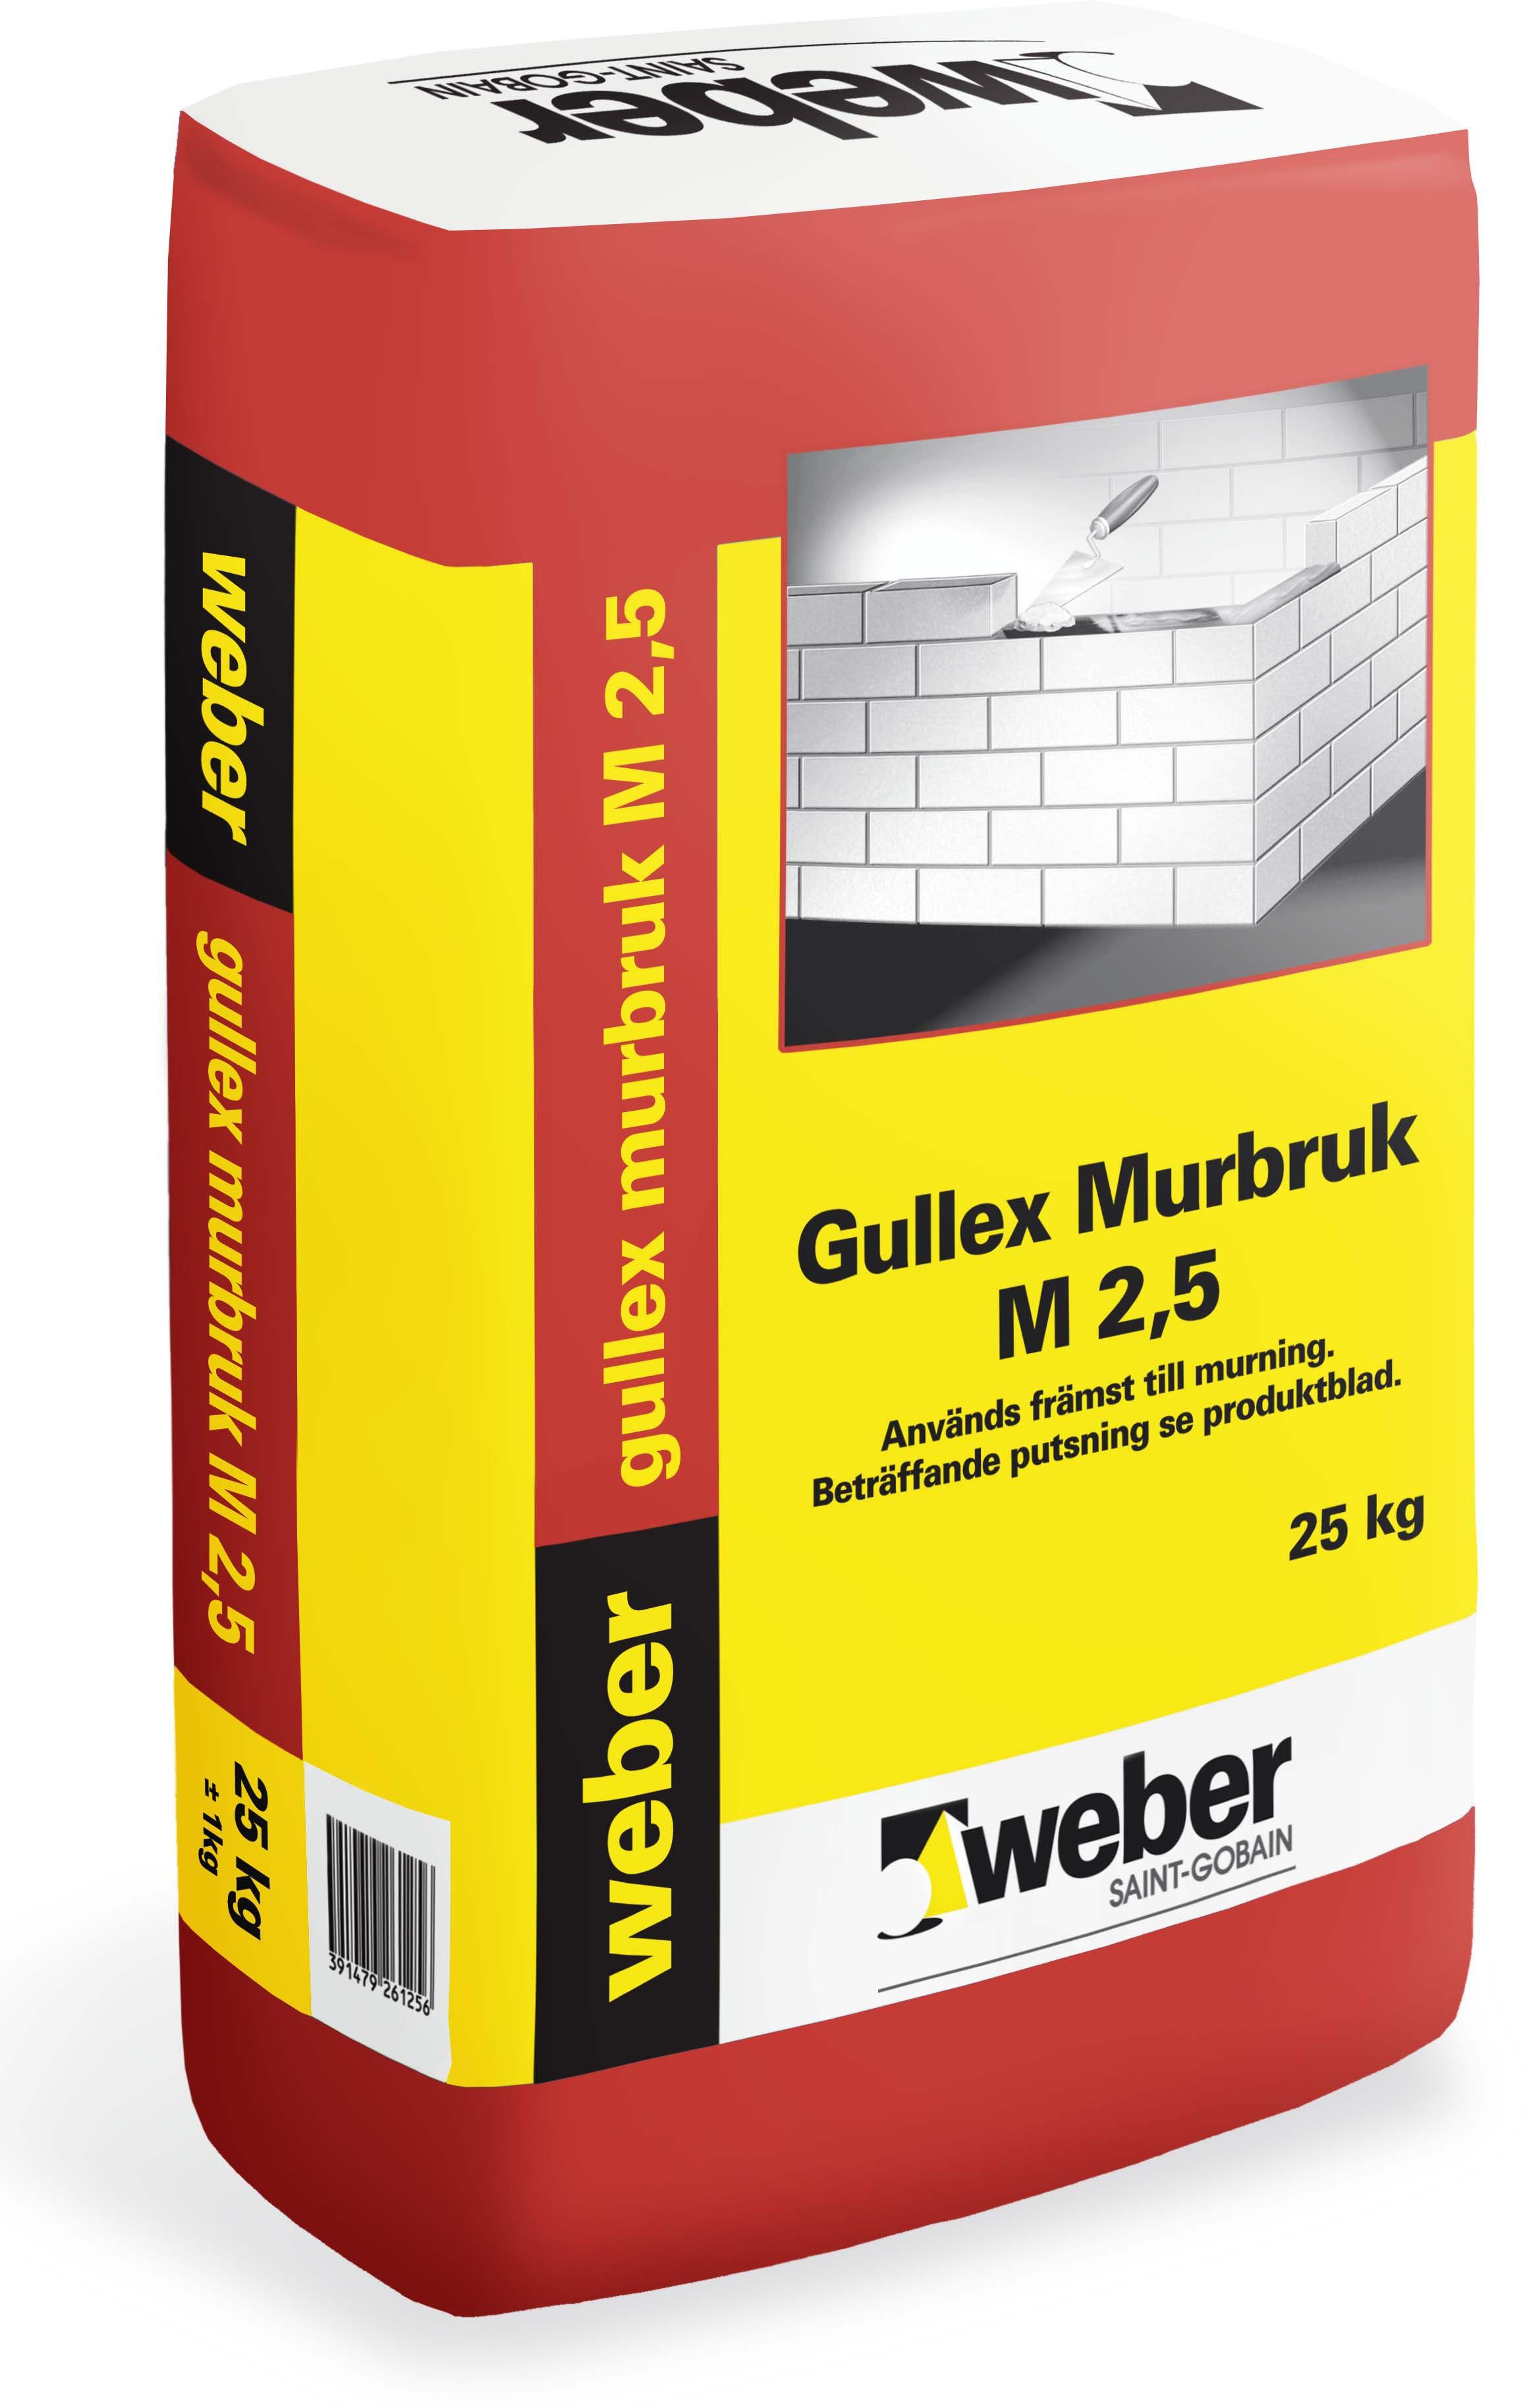 Murbruk Weber Saint-Gobain Gullex M 2,5 25Kg